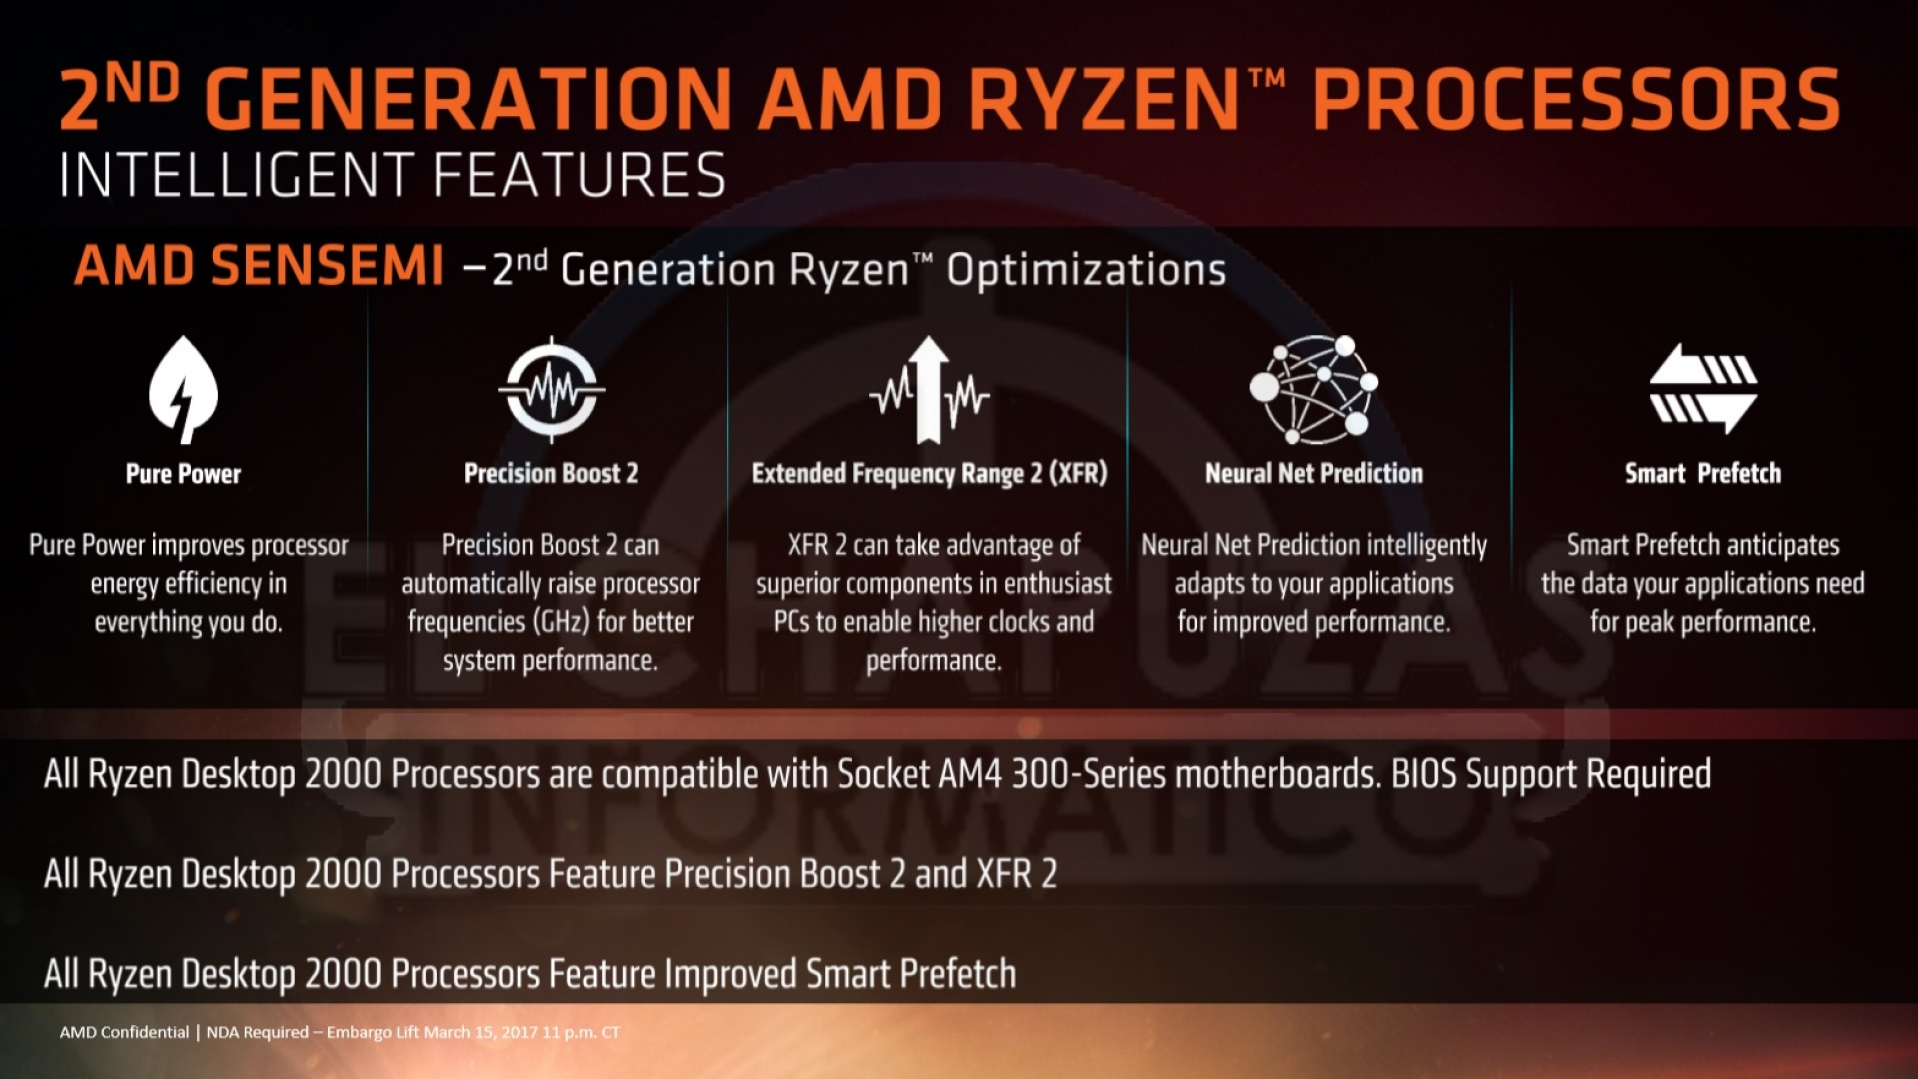 AMD Ryzen 2nd Gen + 400-series Chipset leaks - performance, pricing